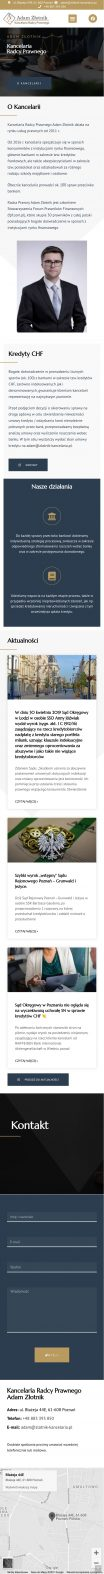 Screencapture Zlotnik Kancelaria Pl 2021 09 28 13 52 40